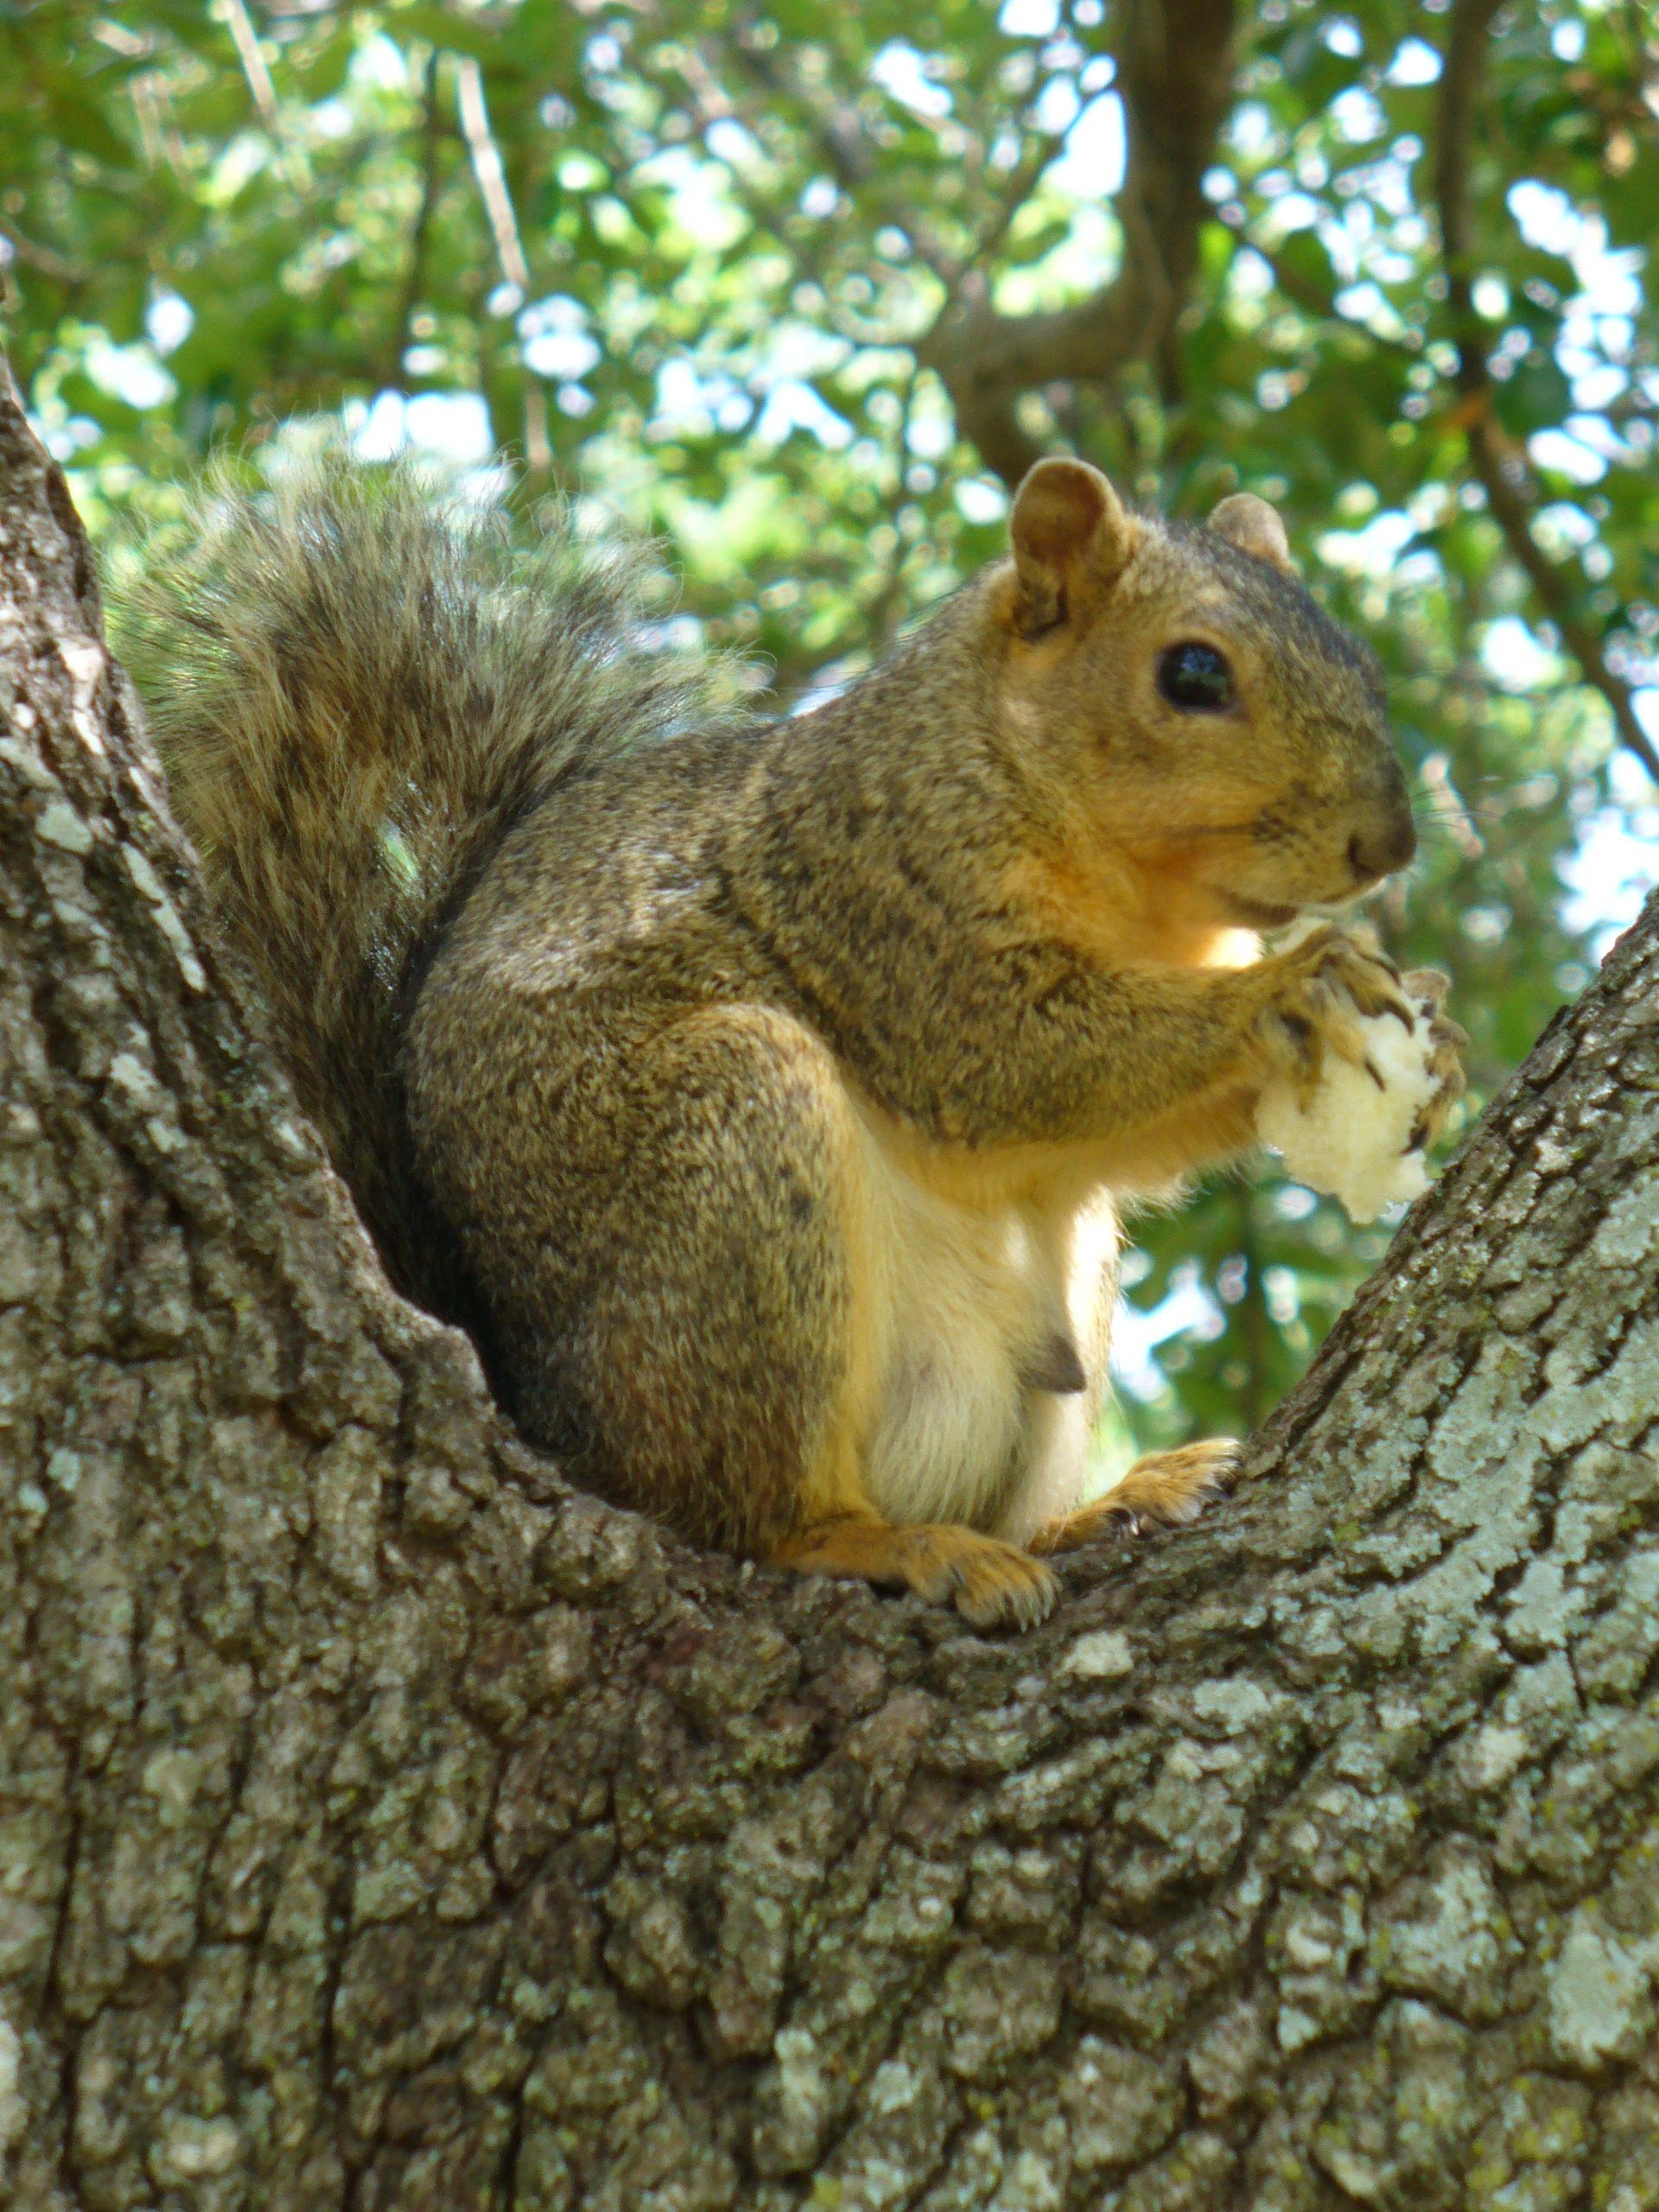 Squirrel, sitting in a tree, in Austin, Texas Squirrel